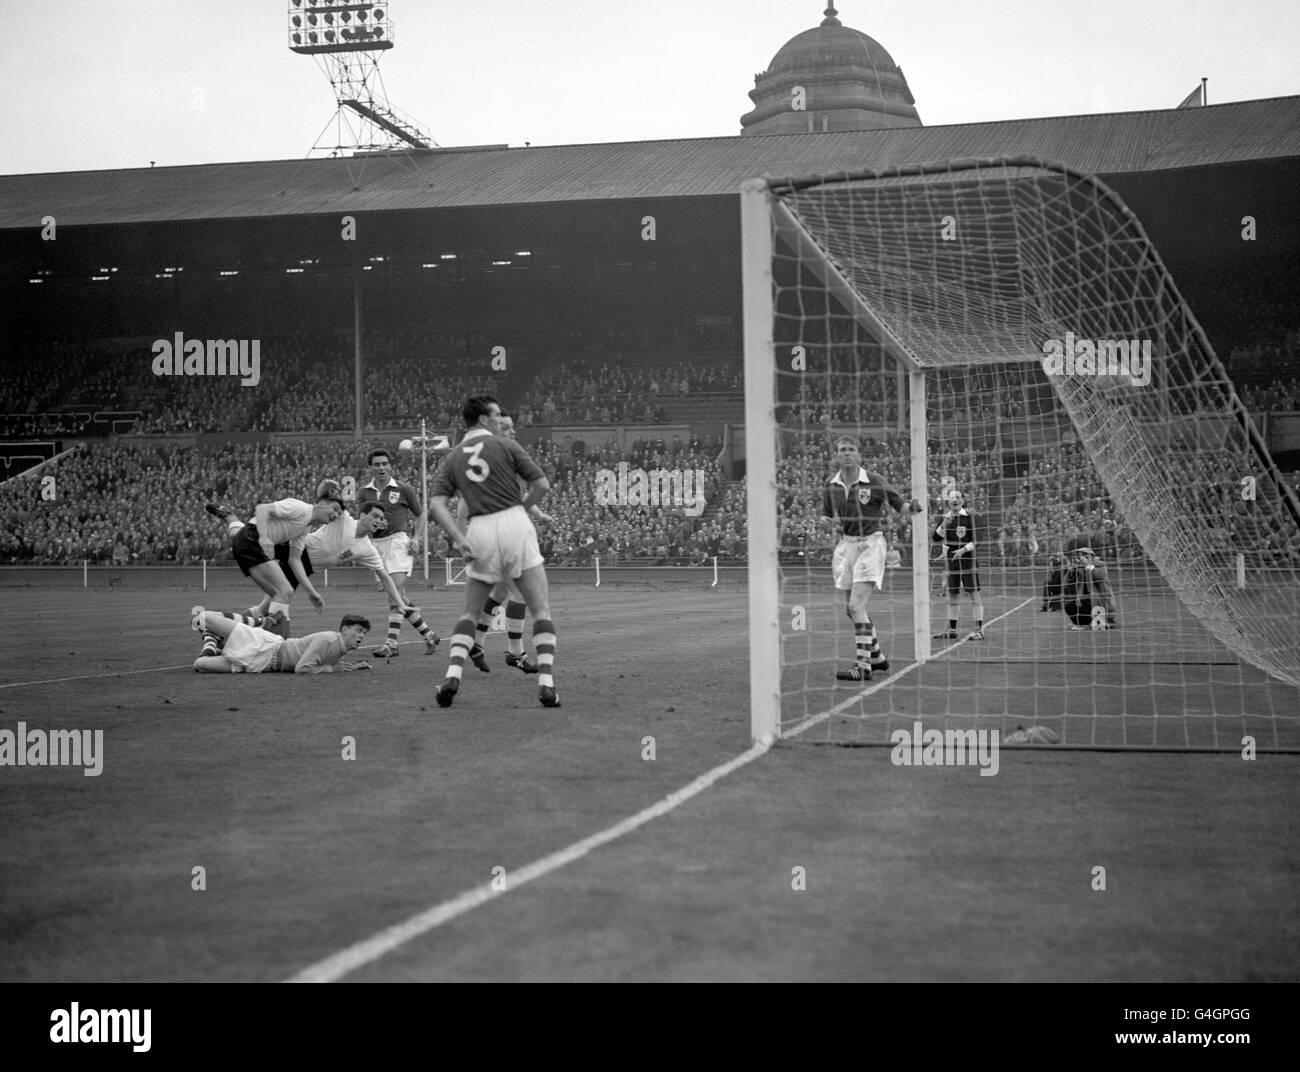 Soccer - World Cup Qualifier - Group One - England v Ireland - Wembley Stadium - Stock Image